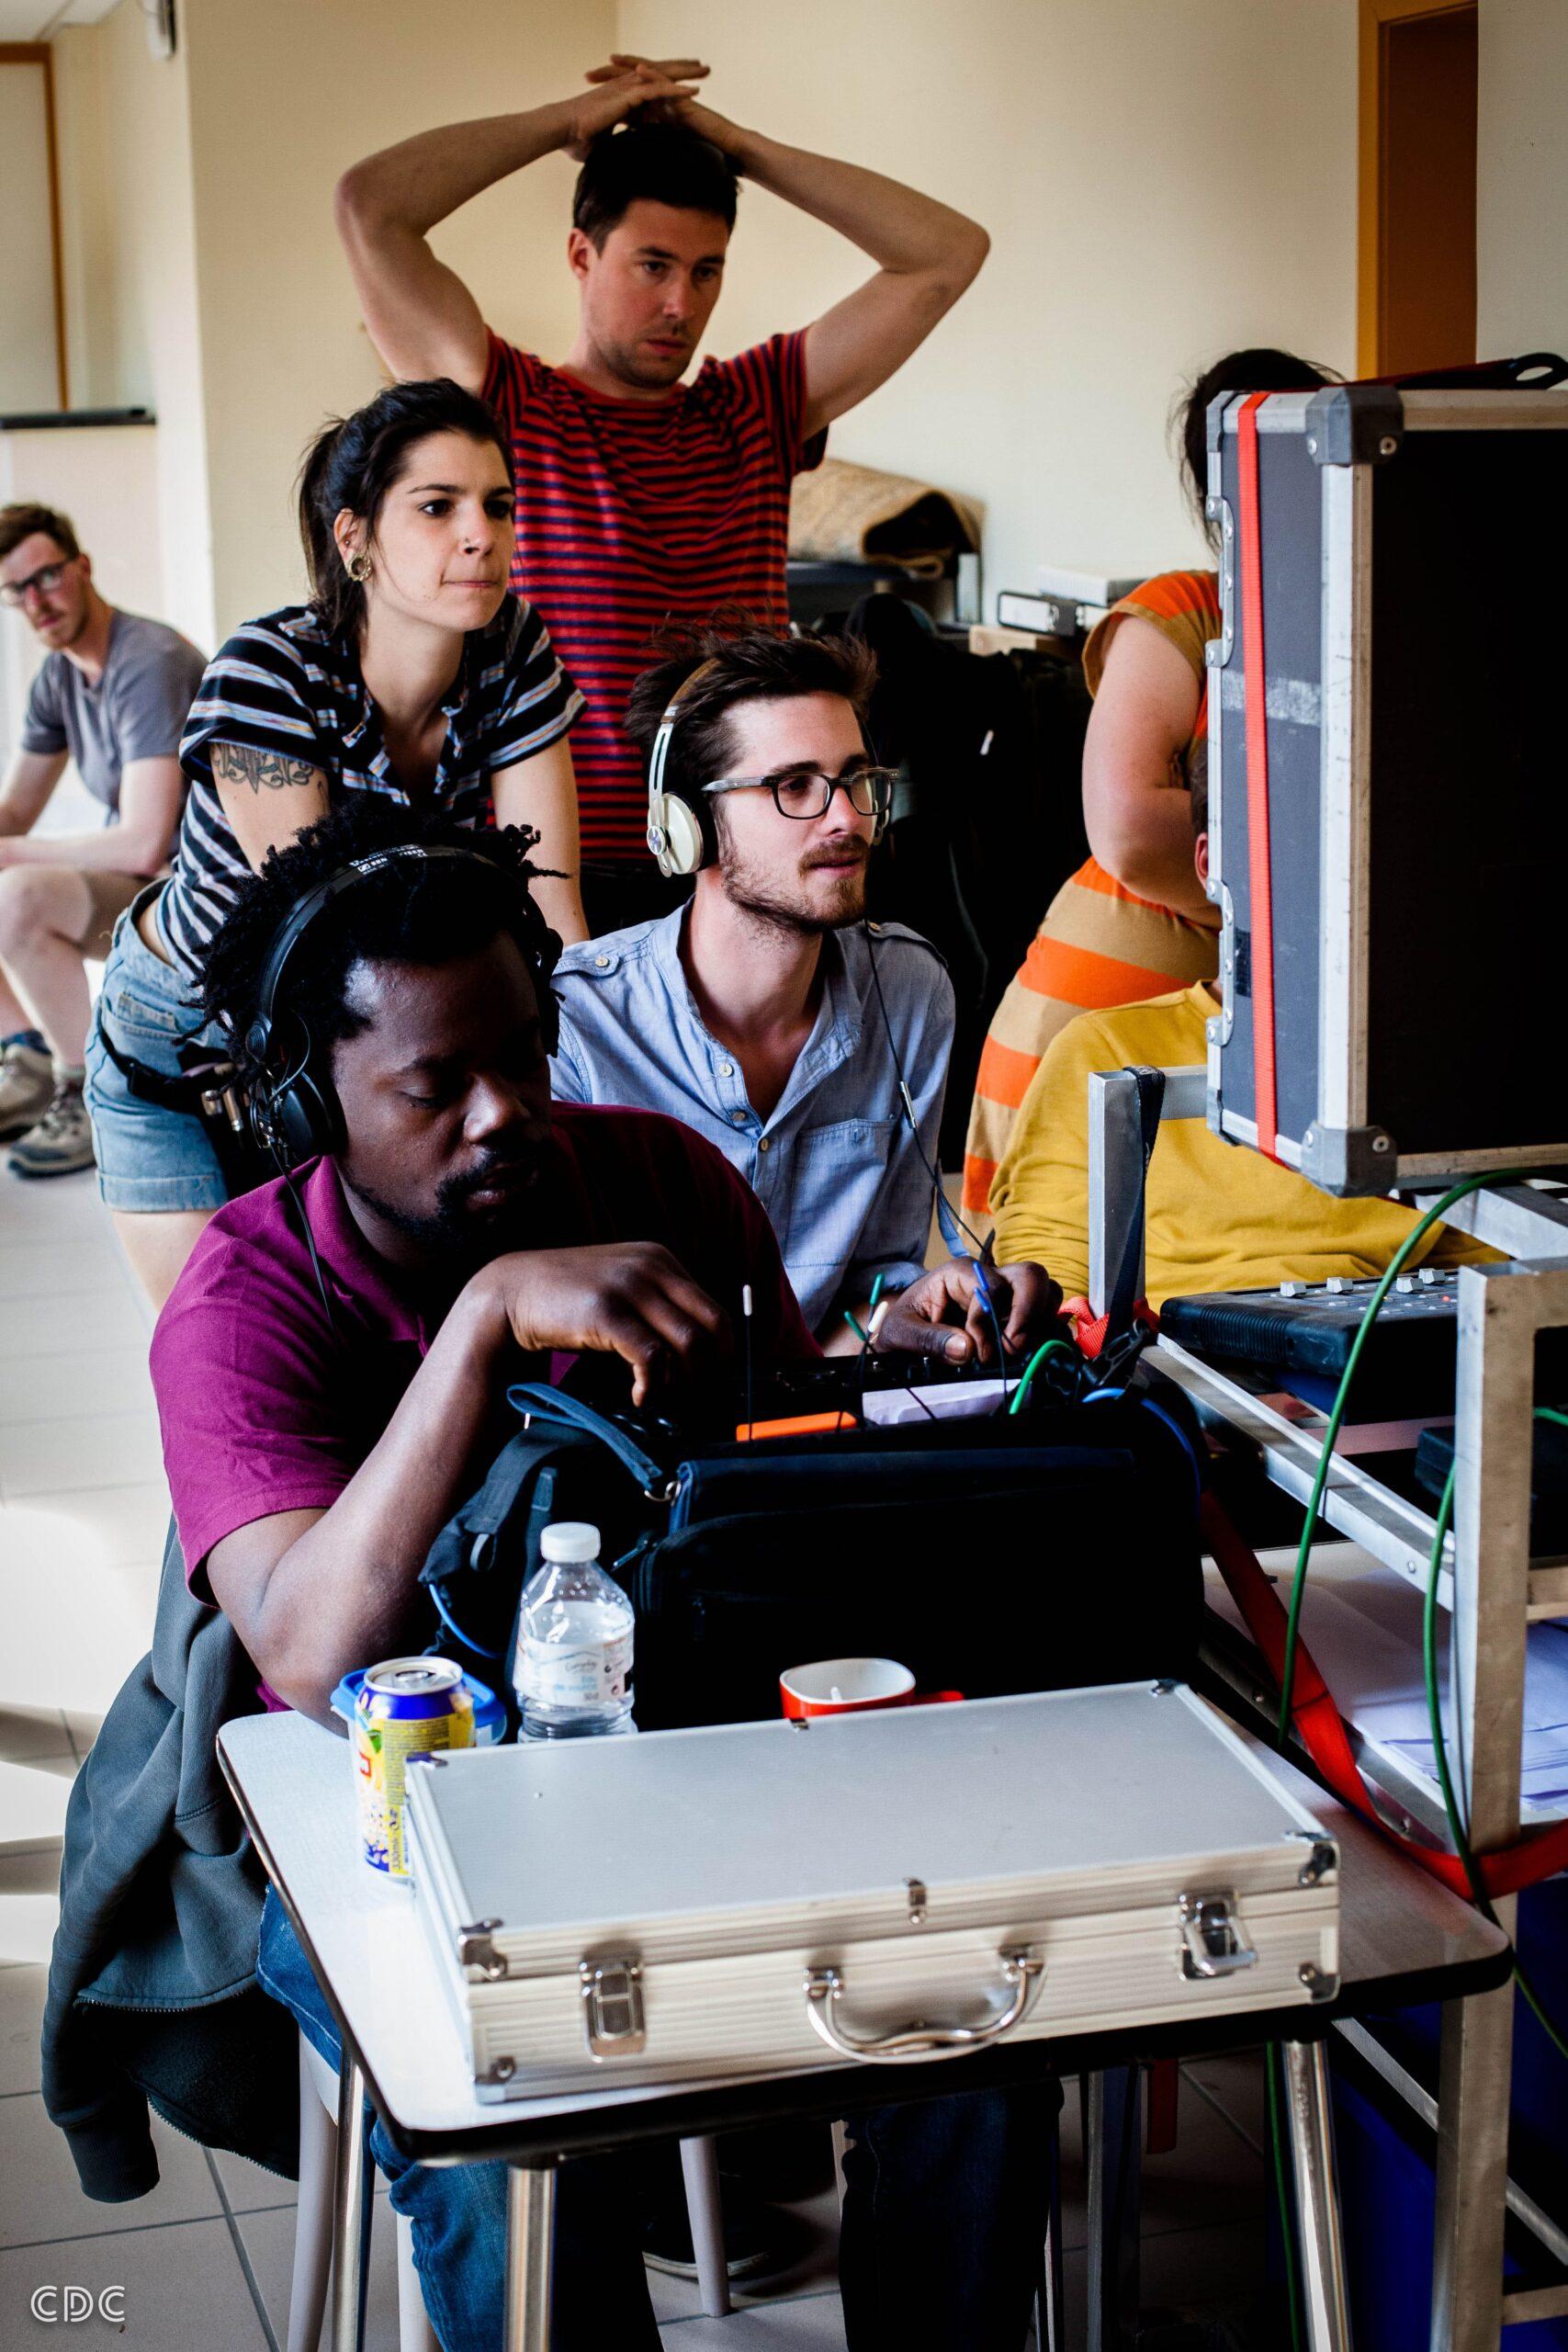 Storytellers, Filmmakers, Digitale Strategen,...